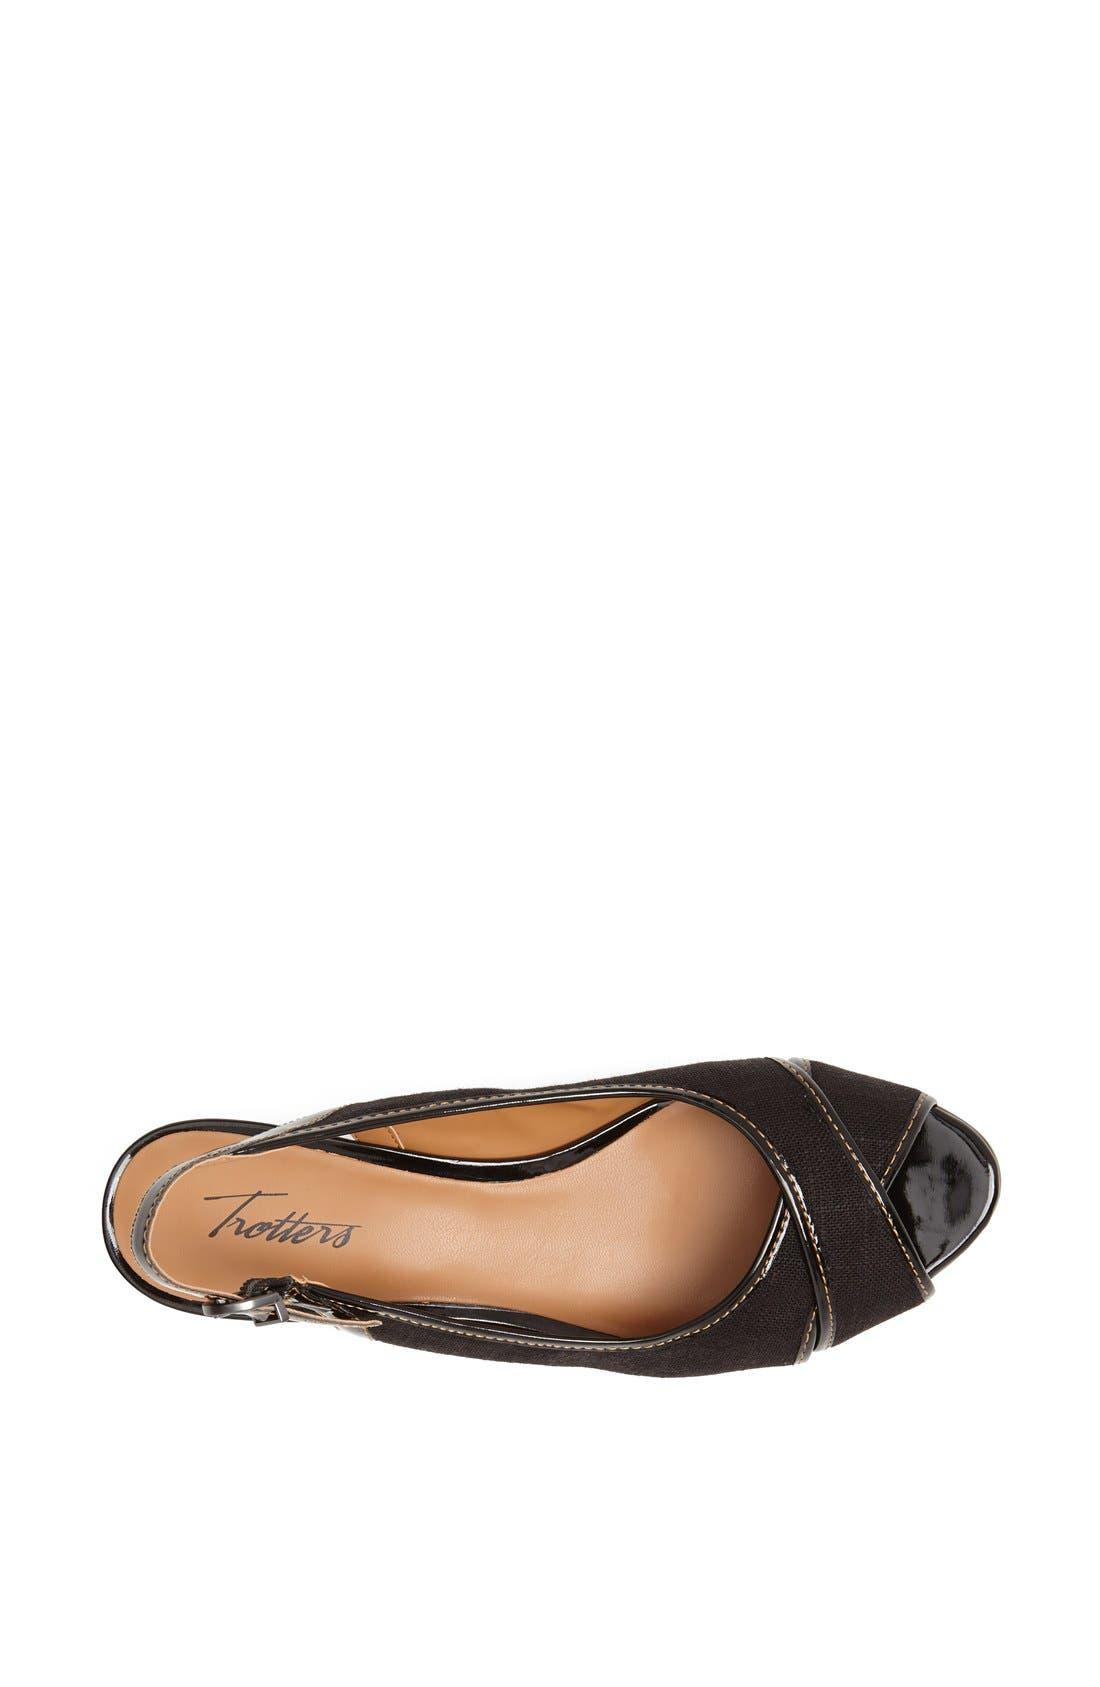 Alternate Image 3  - Trotters 'Calle' Slingback Sandal